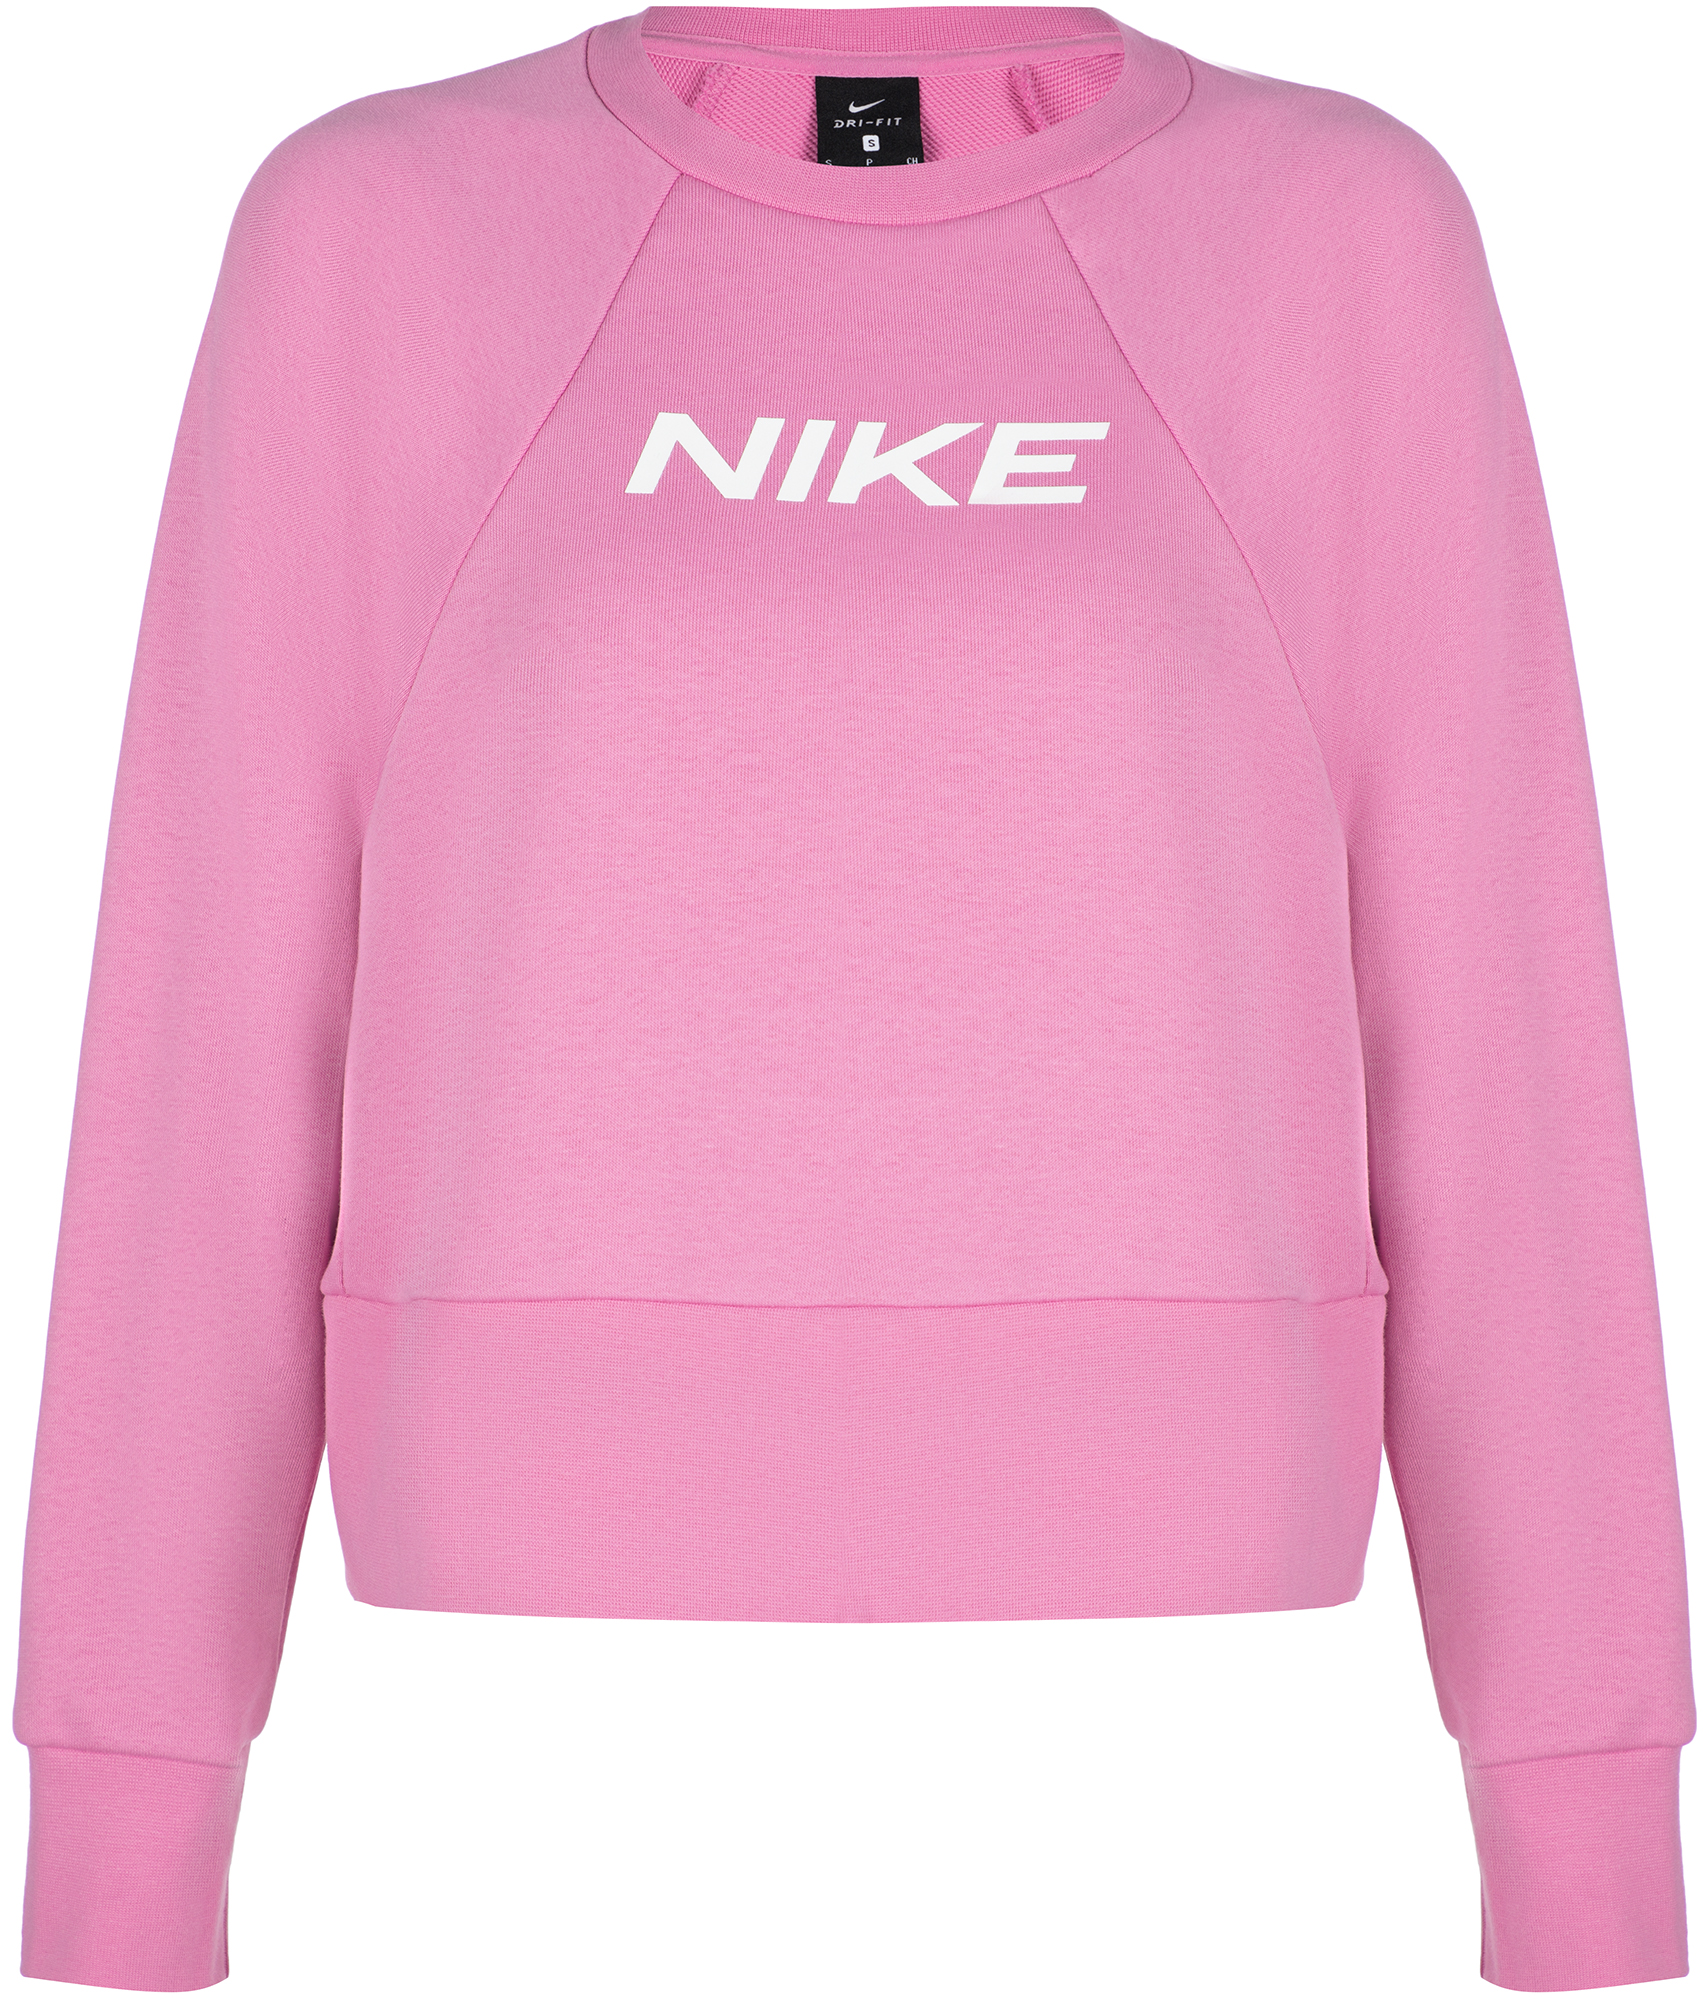 Nike Свитшот женский Dri-FIT Get Fit, размер 48-50